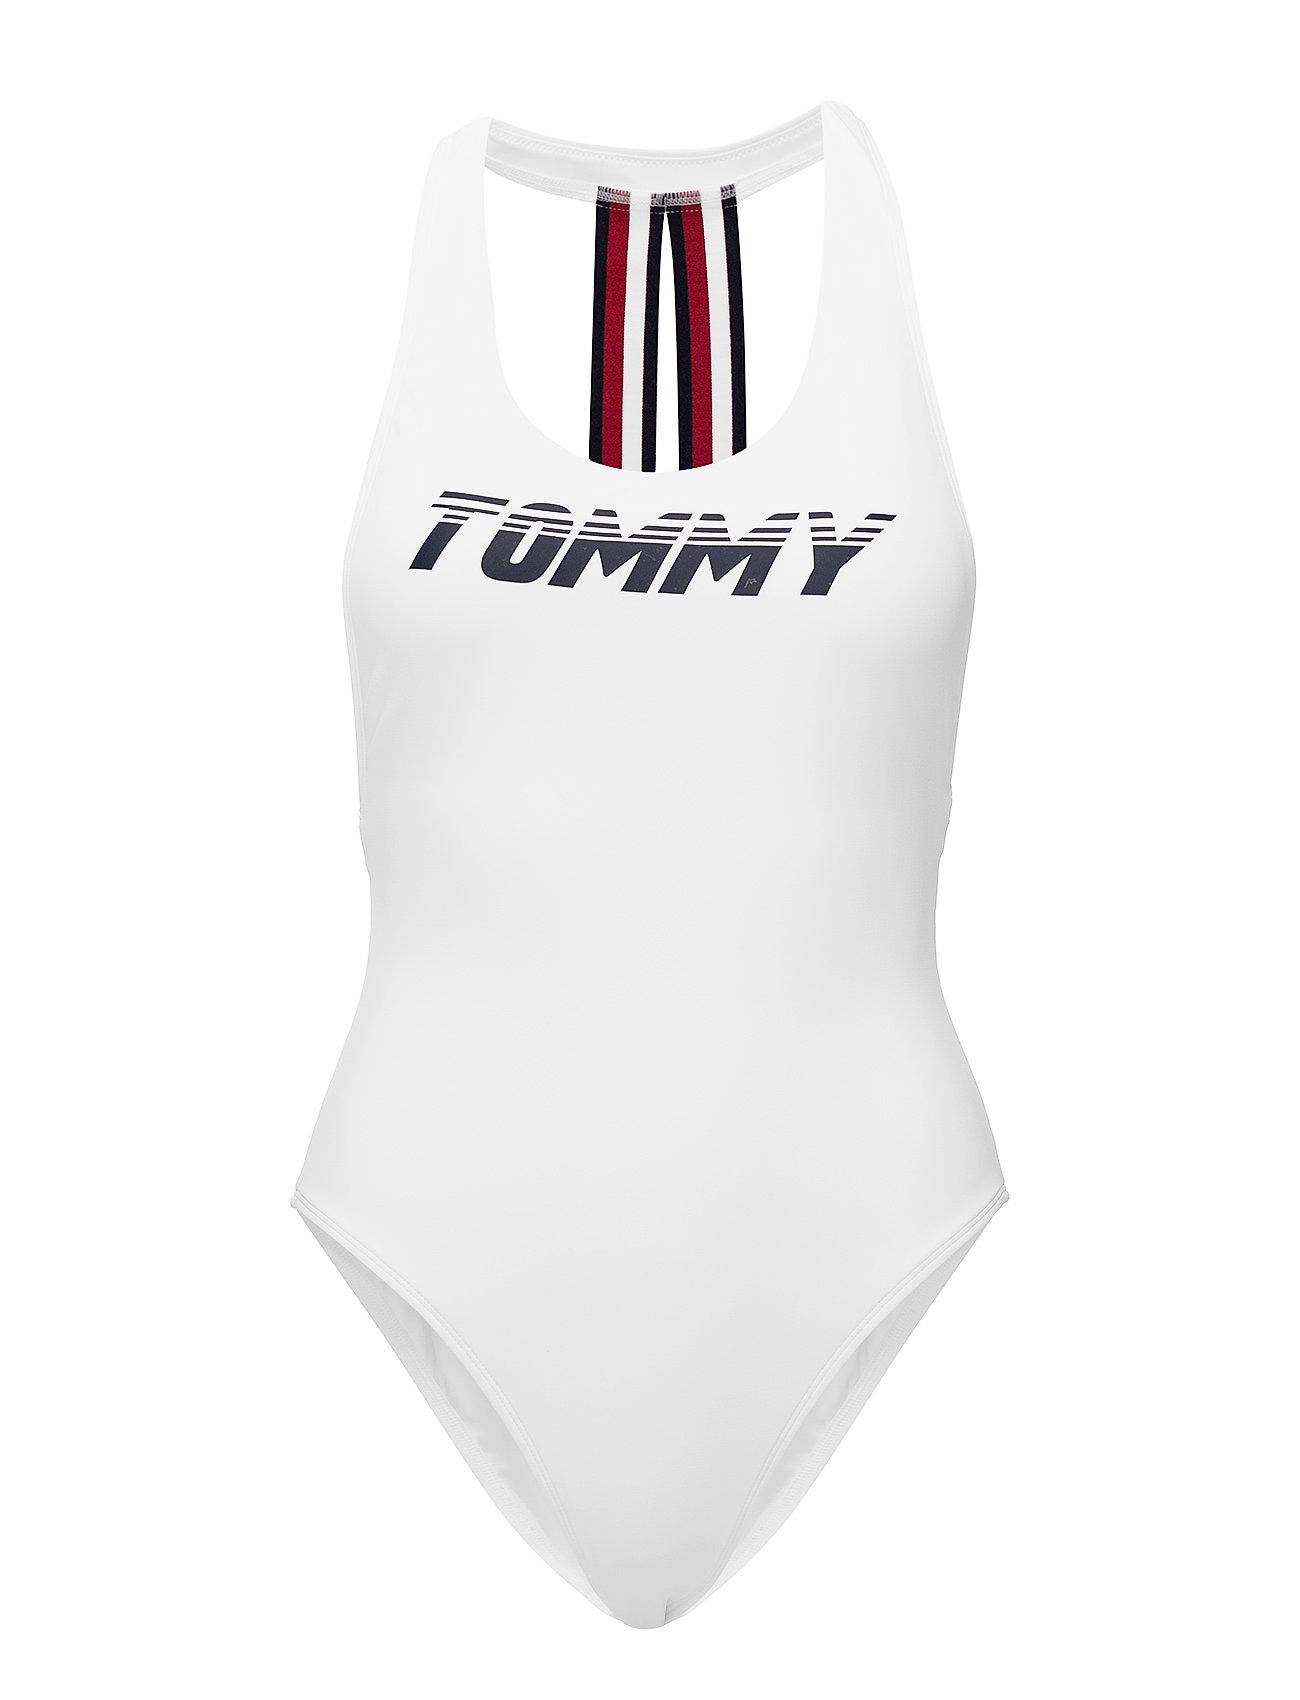 Tommy Hilfiger GIGI HADID ONE-PIECE - BRIGHT WHITE